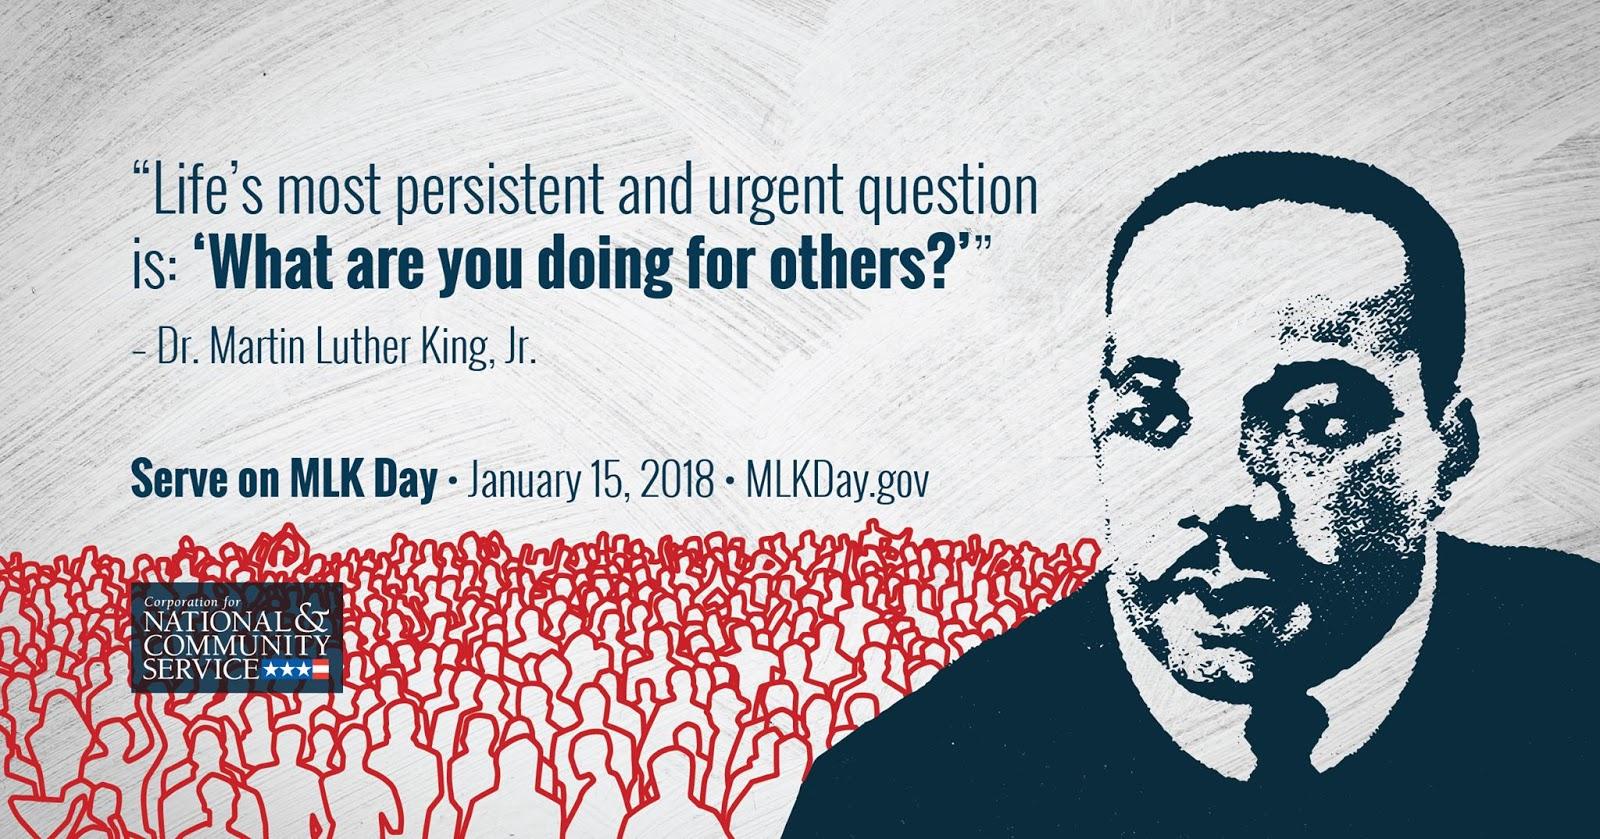 PROYECTO BILINGÜE: Celebrating Martin Luther King Jr.